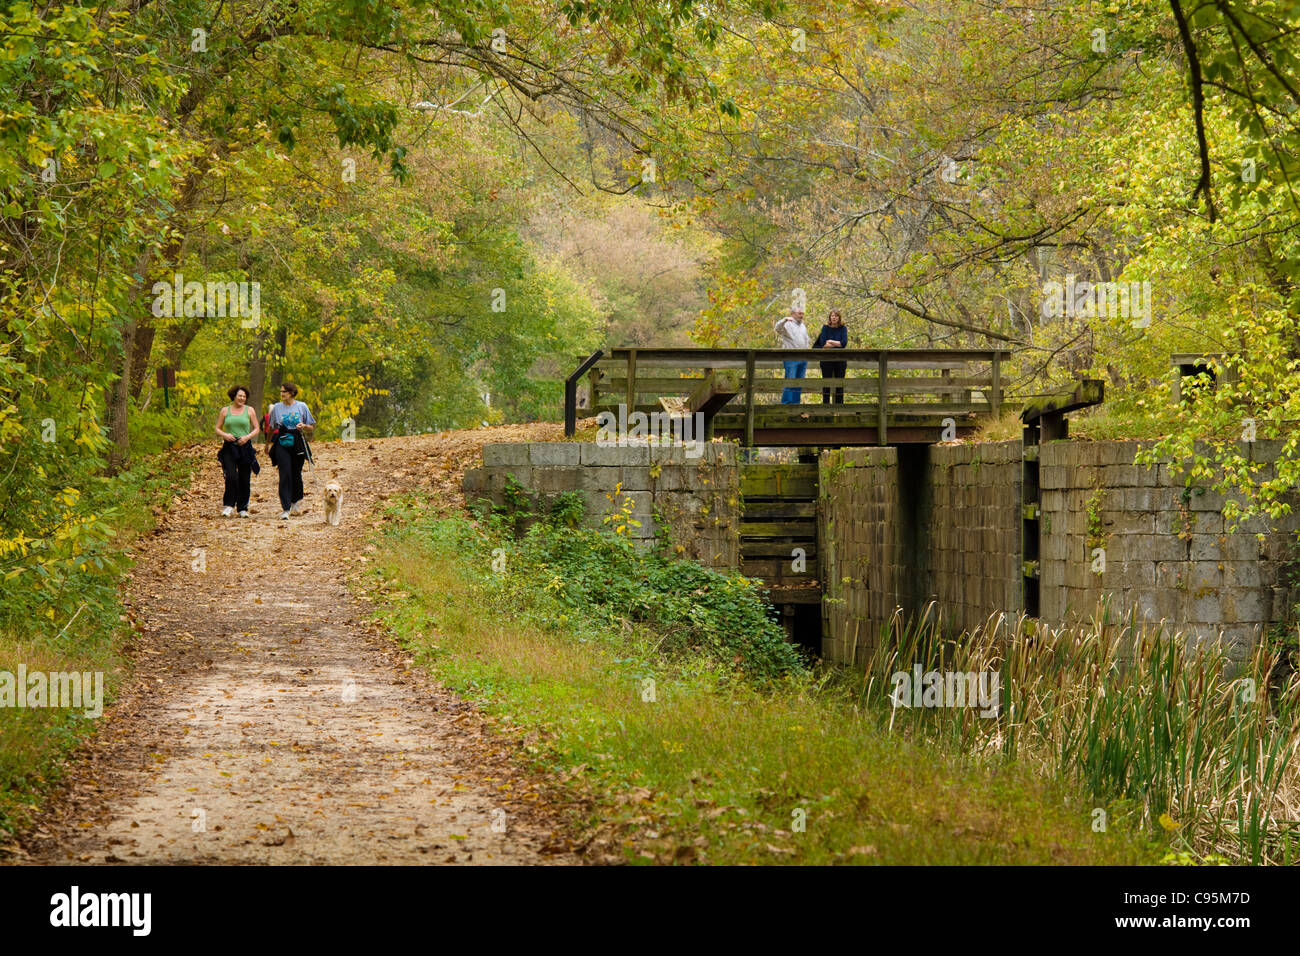 C&O Canal National Historical Park towpath, lock 10, near Glen Echo, Maryland - Stock Image